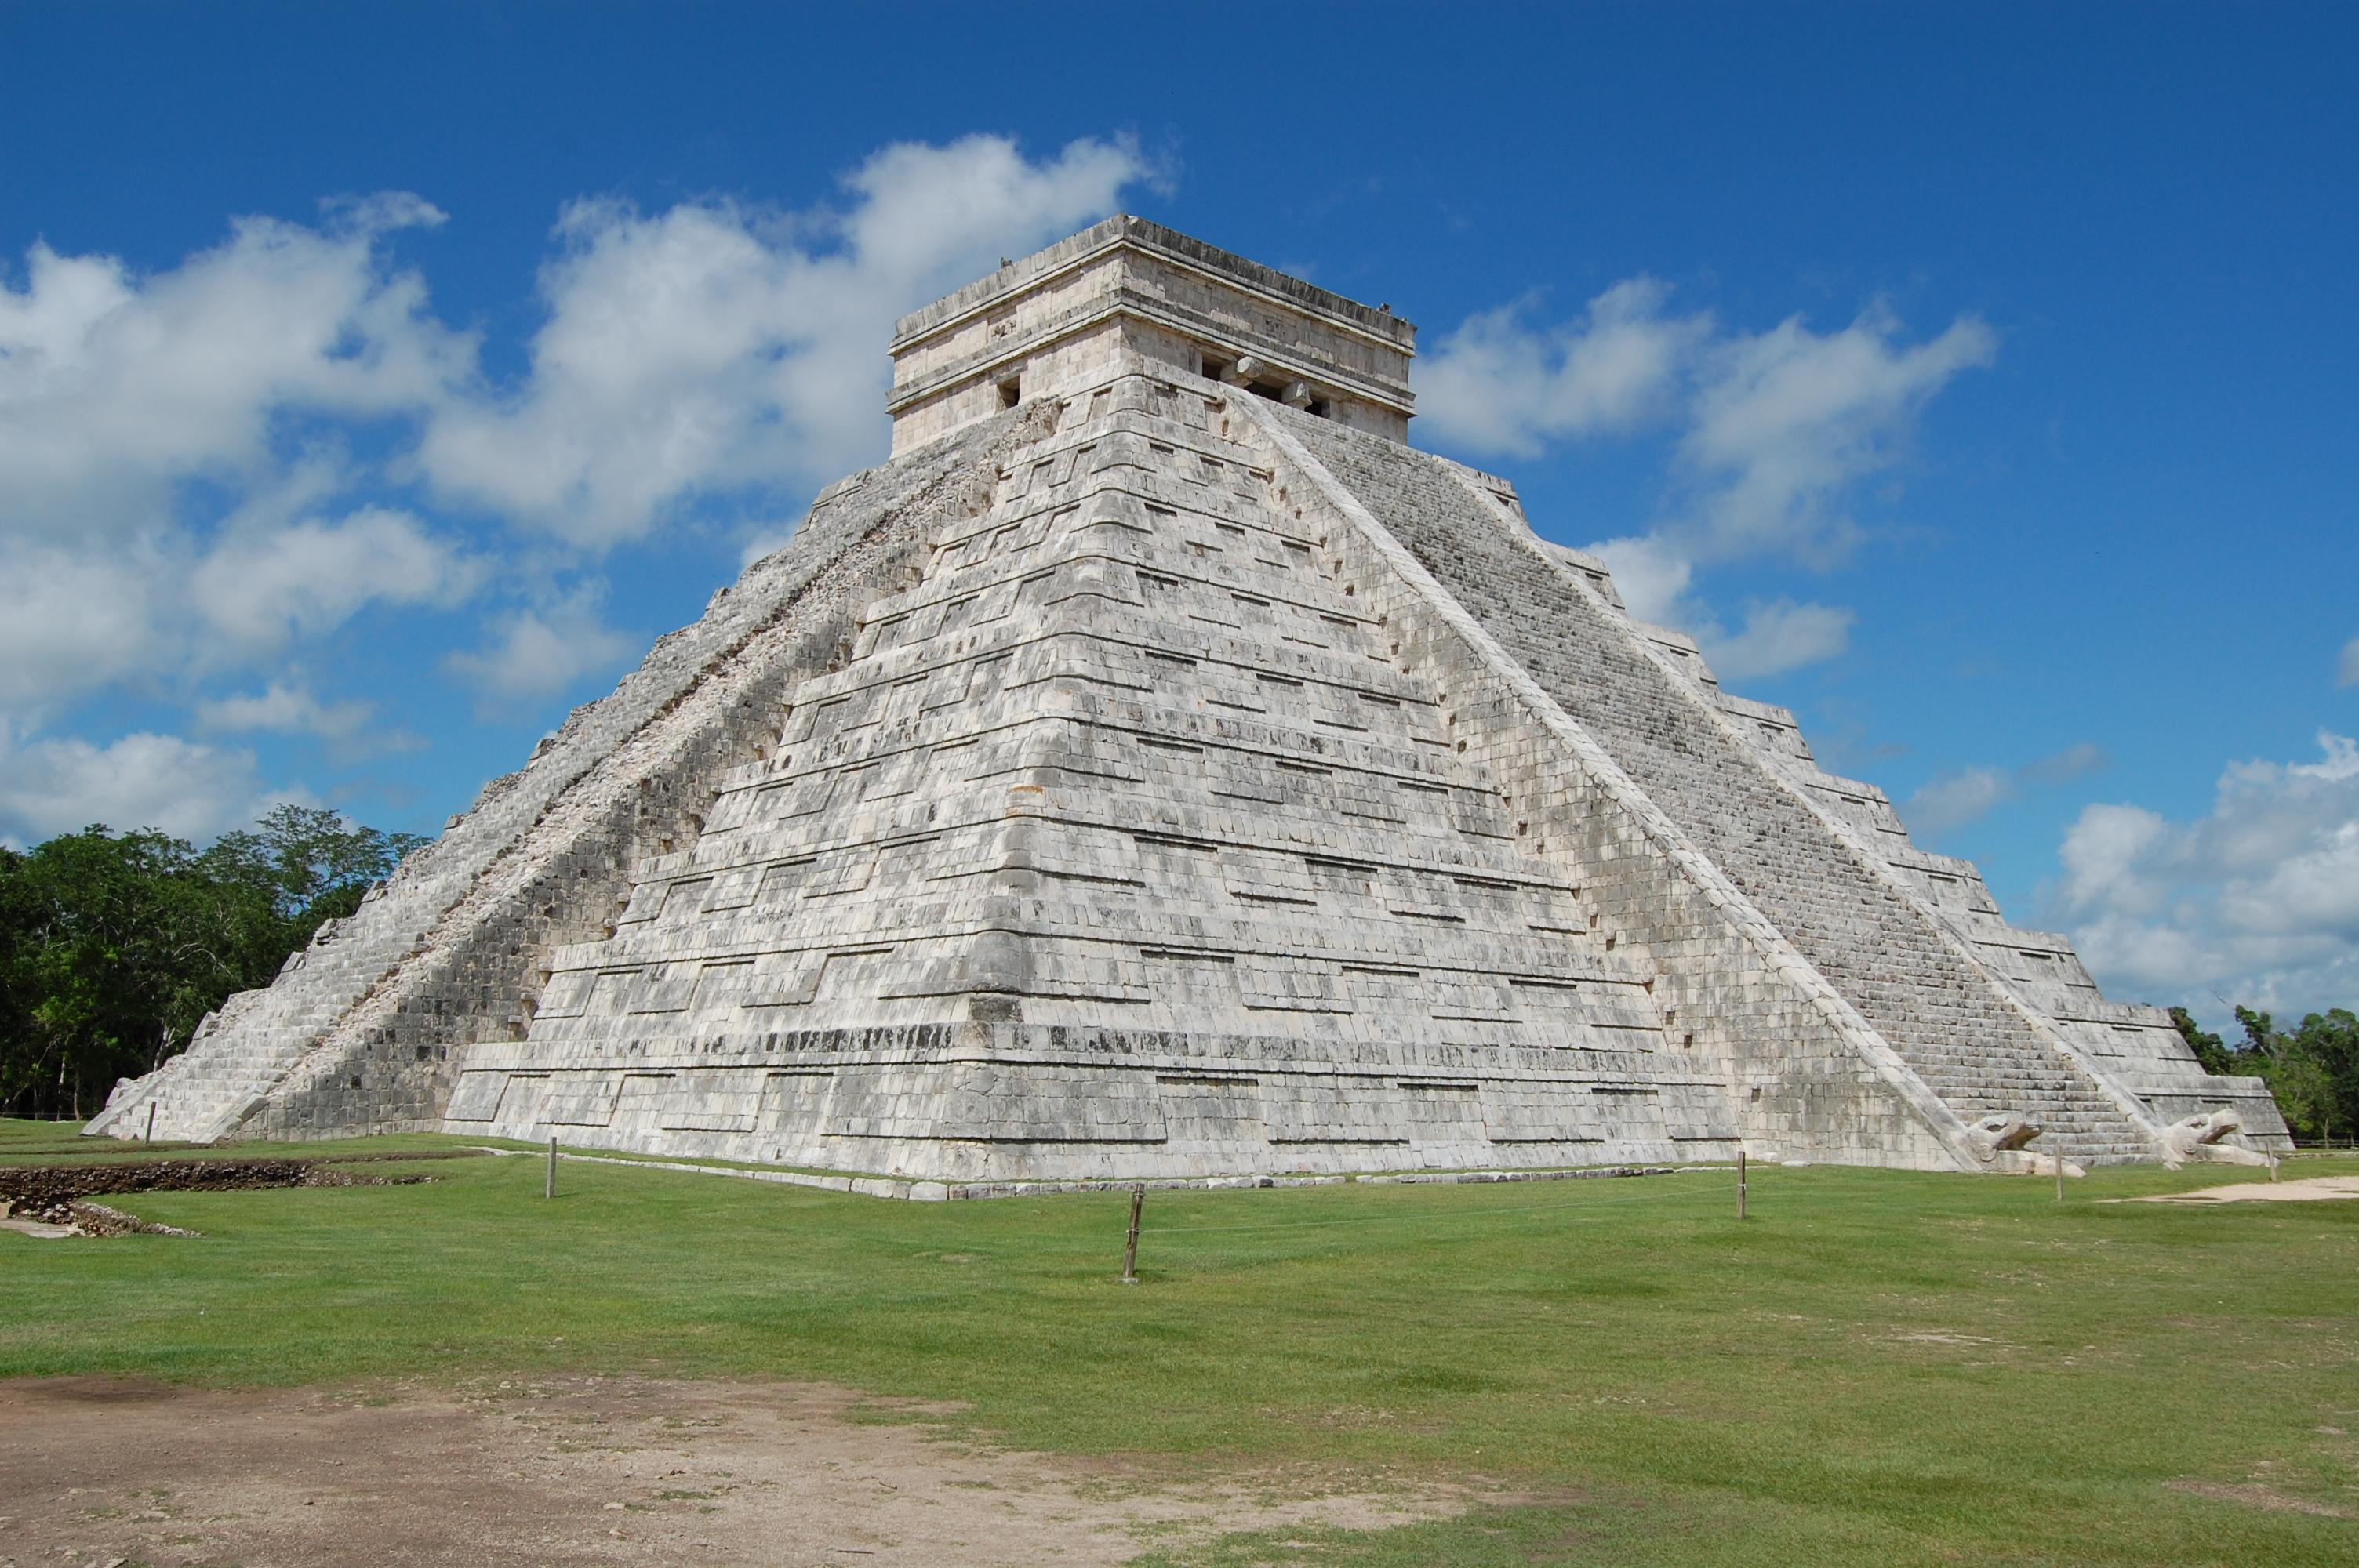 File:003 El Castillo o templo de Kukulkan. Chichén Itzá, México. MPLC.jpg - Wikimedia Commons